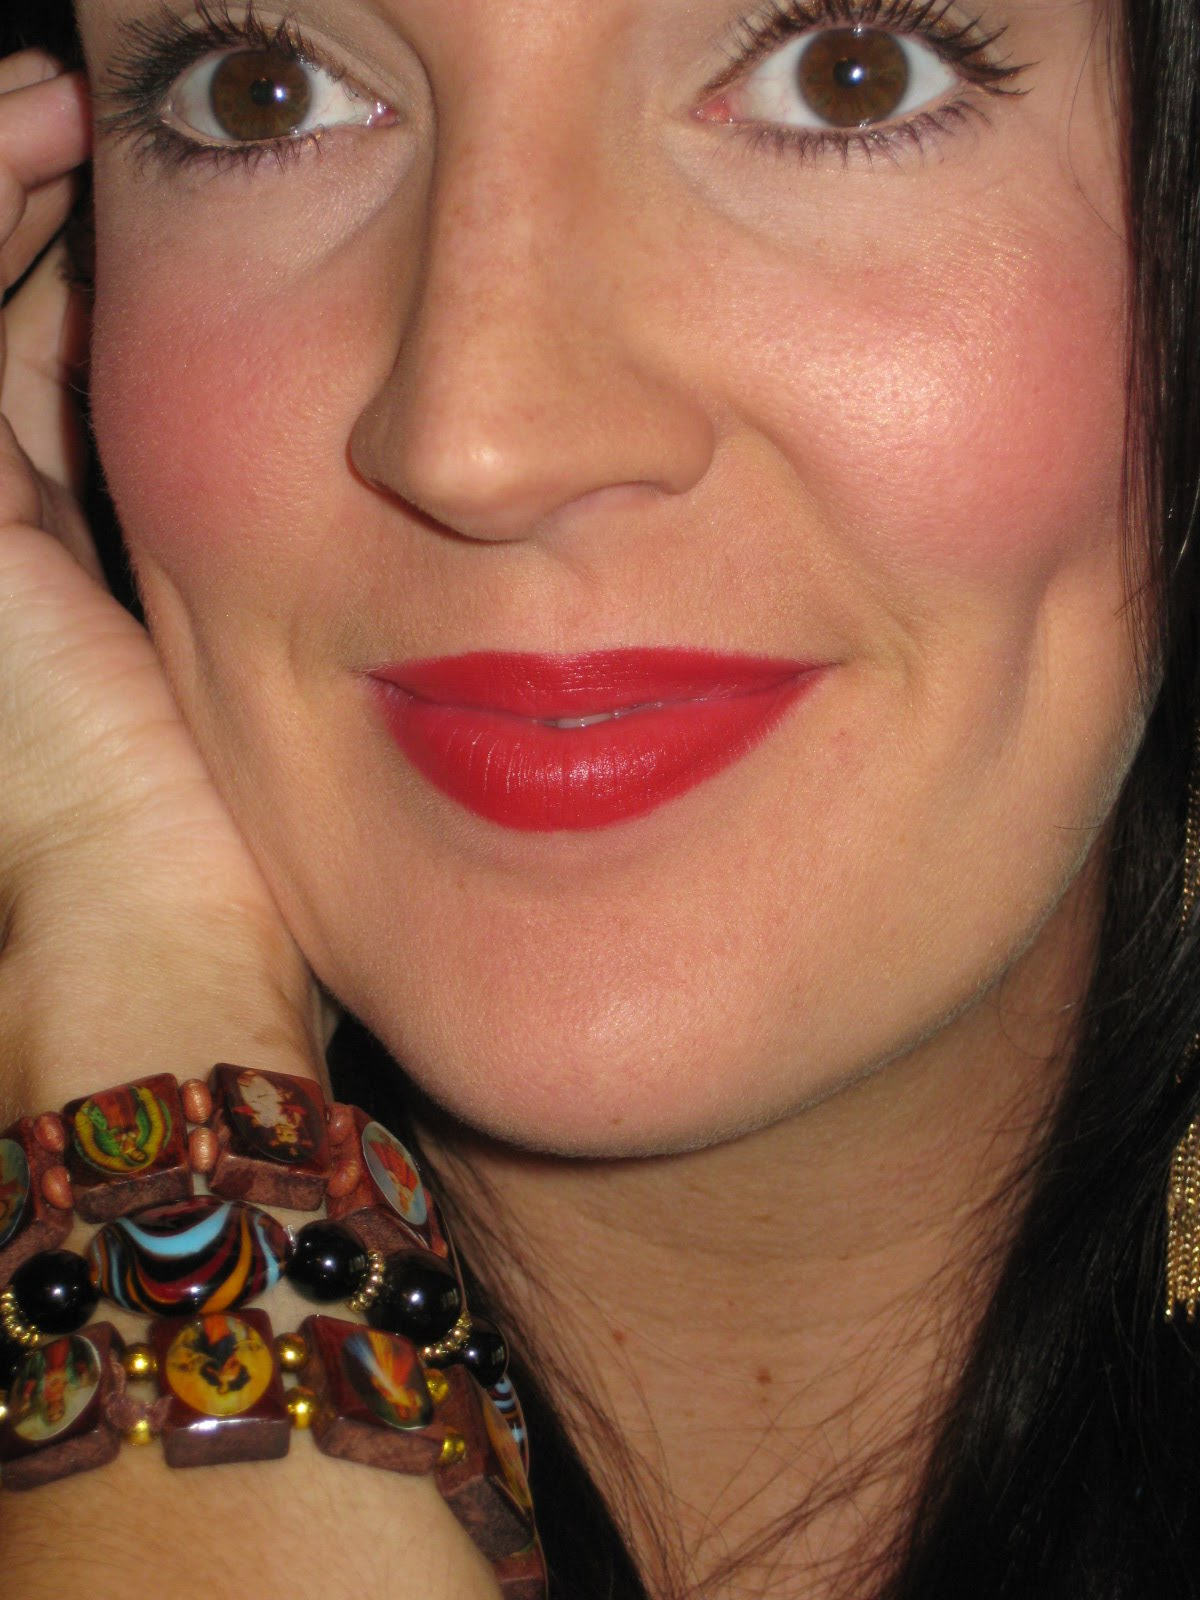 Mac 182 Buffer Brush Reviews Photos Ingredients: Red Hot Cult Favorite :: MAC Russian Red Lipstick